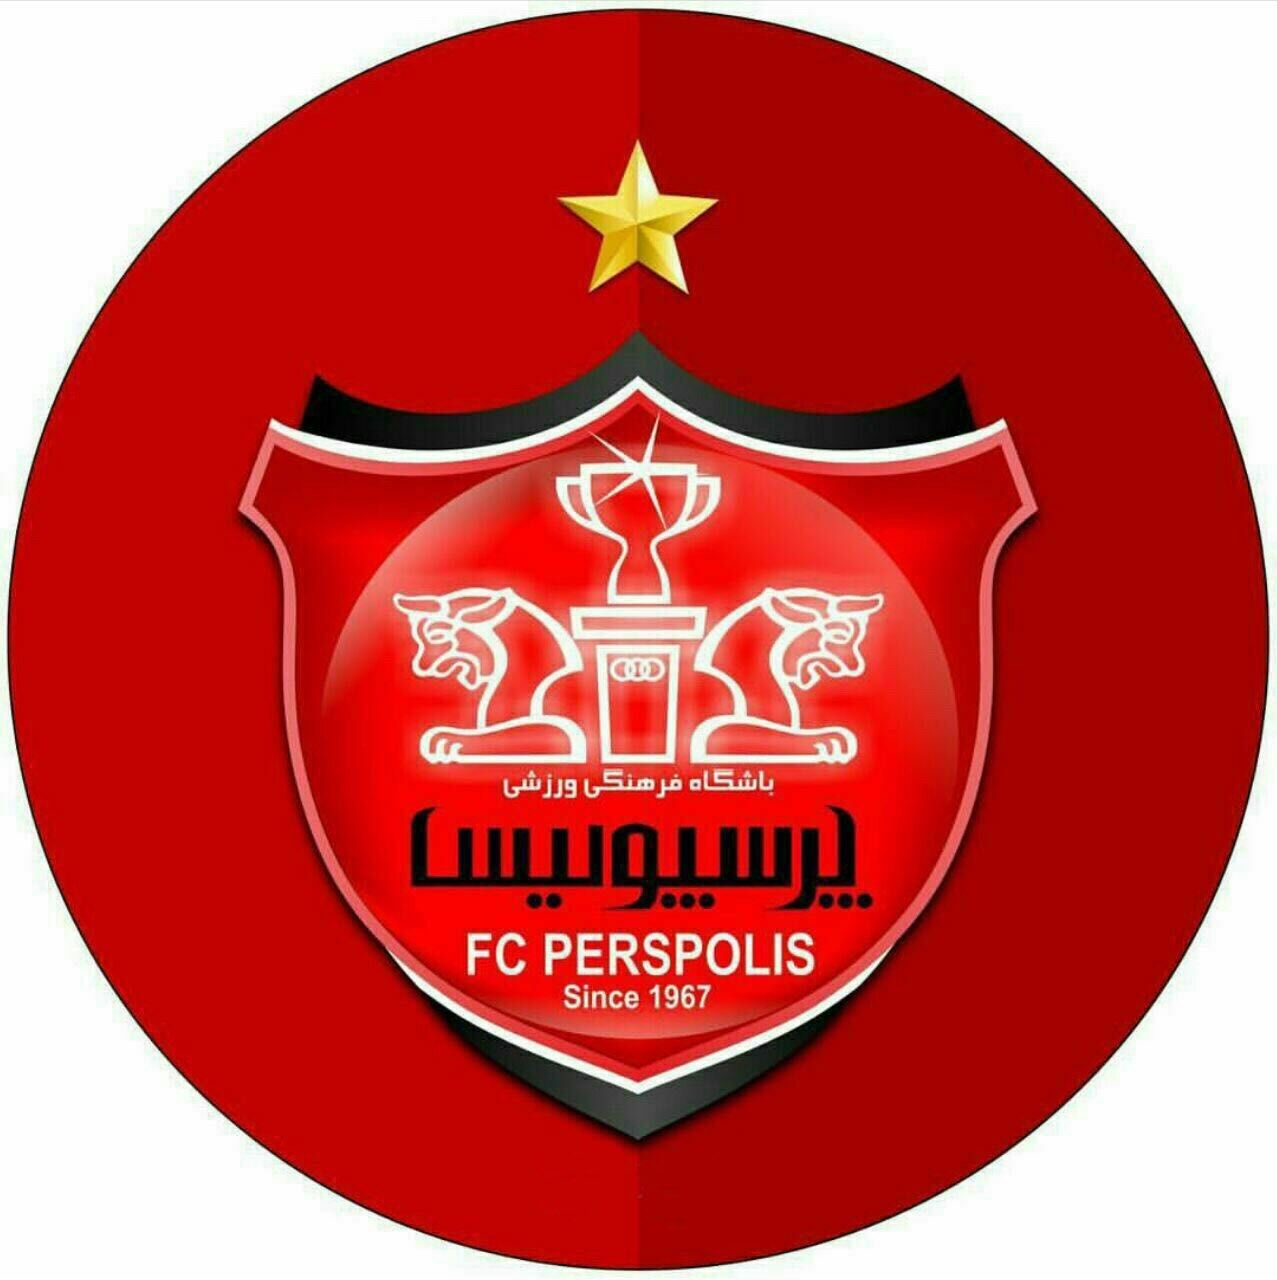 The Best Football Club In Iran F C Perspolis Iran National Football Team Football Team Football Club